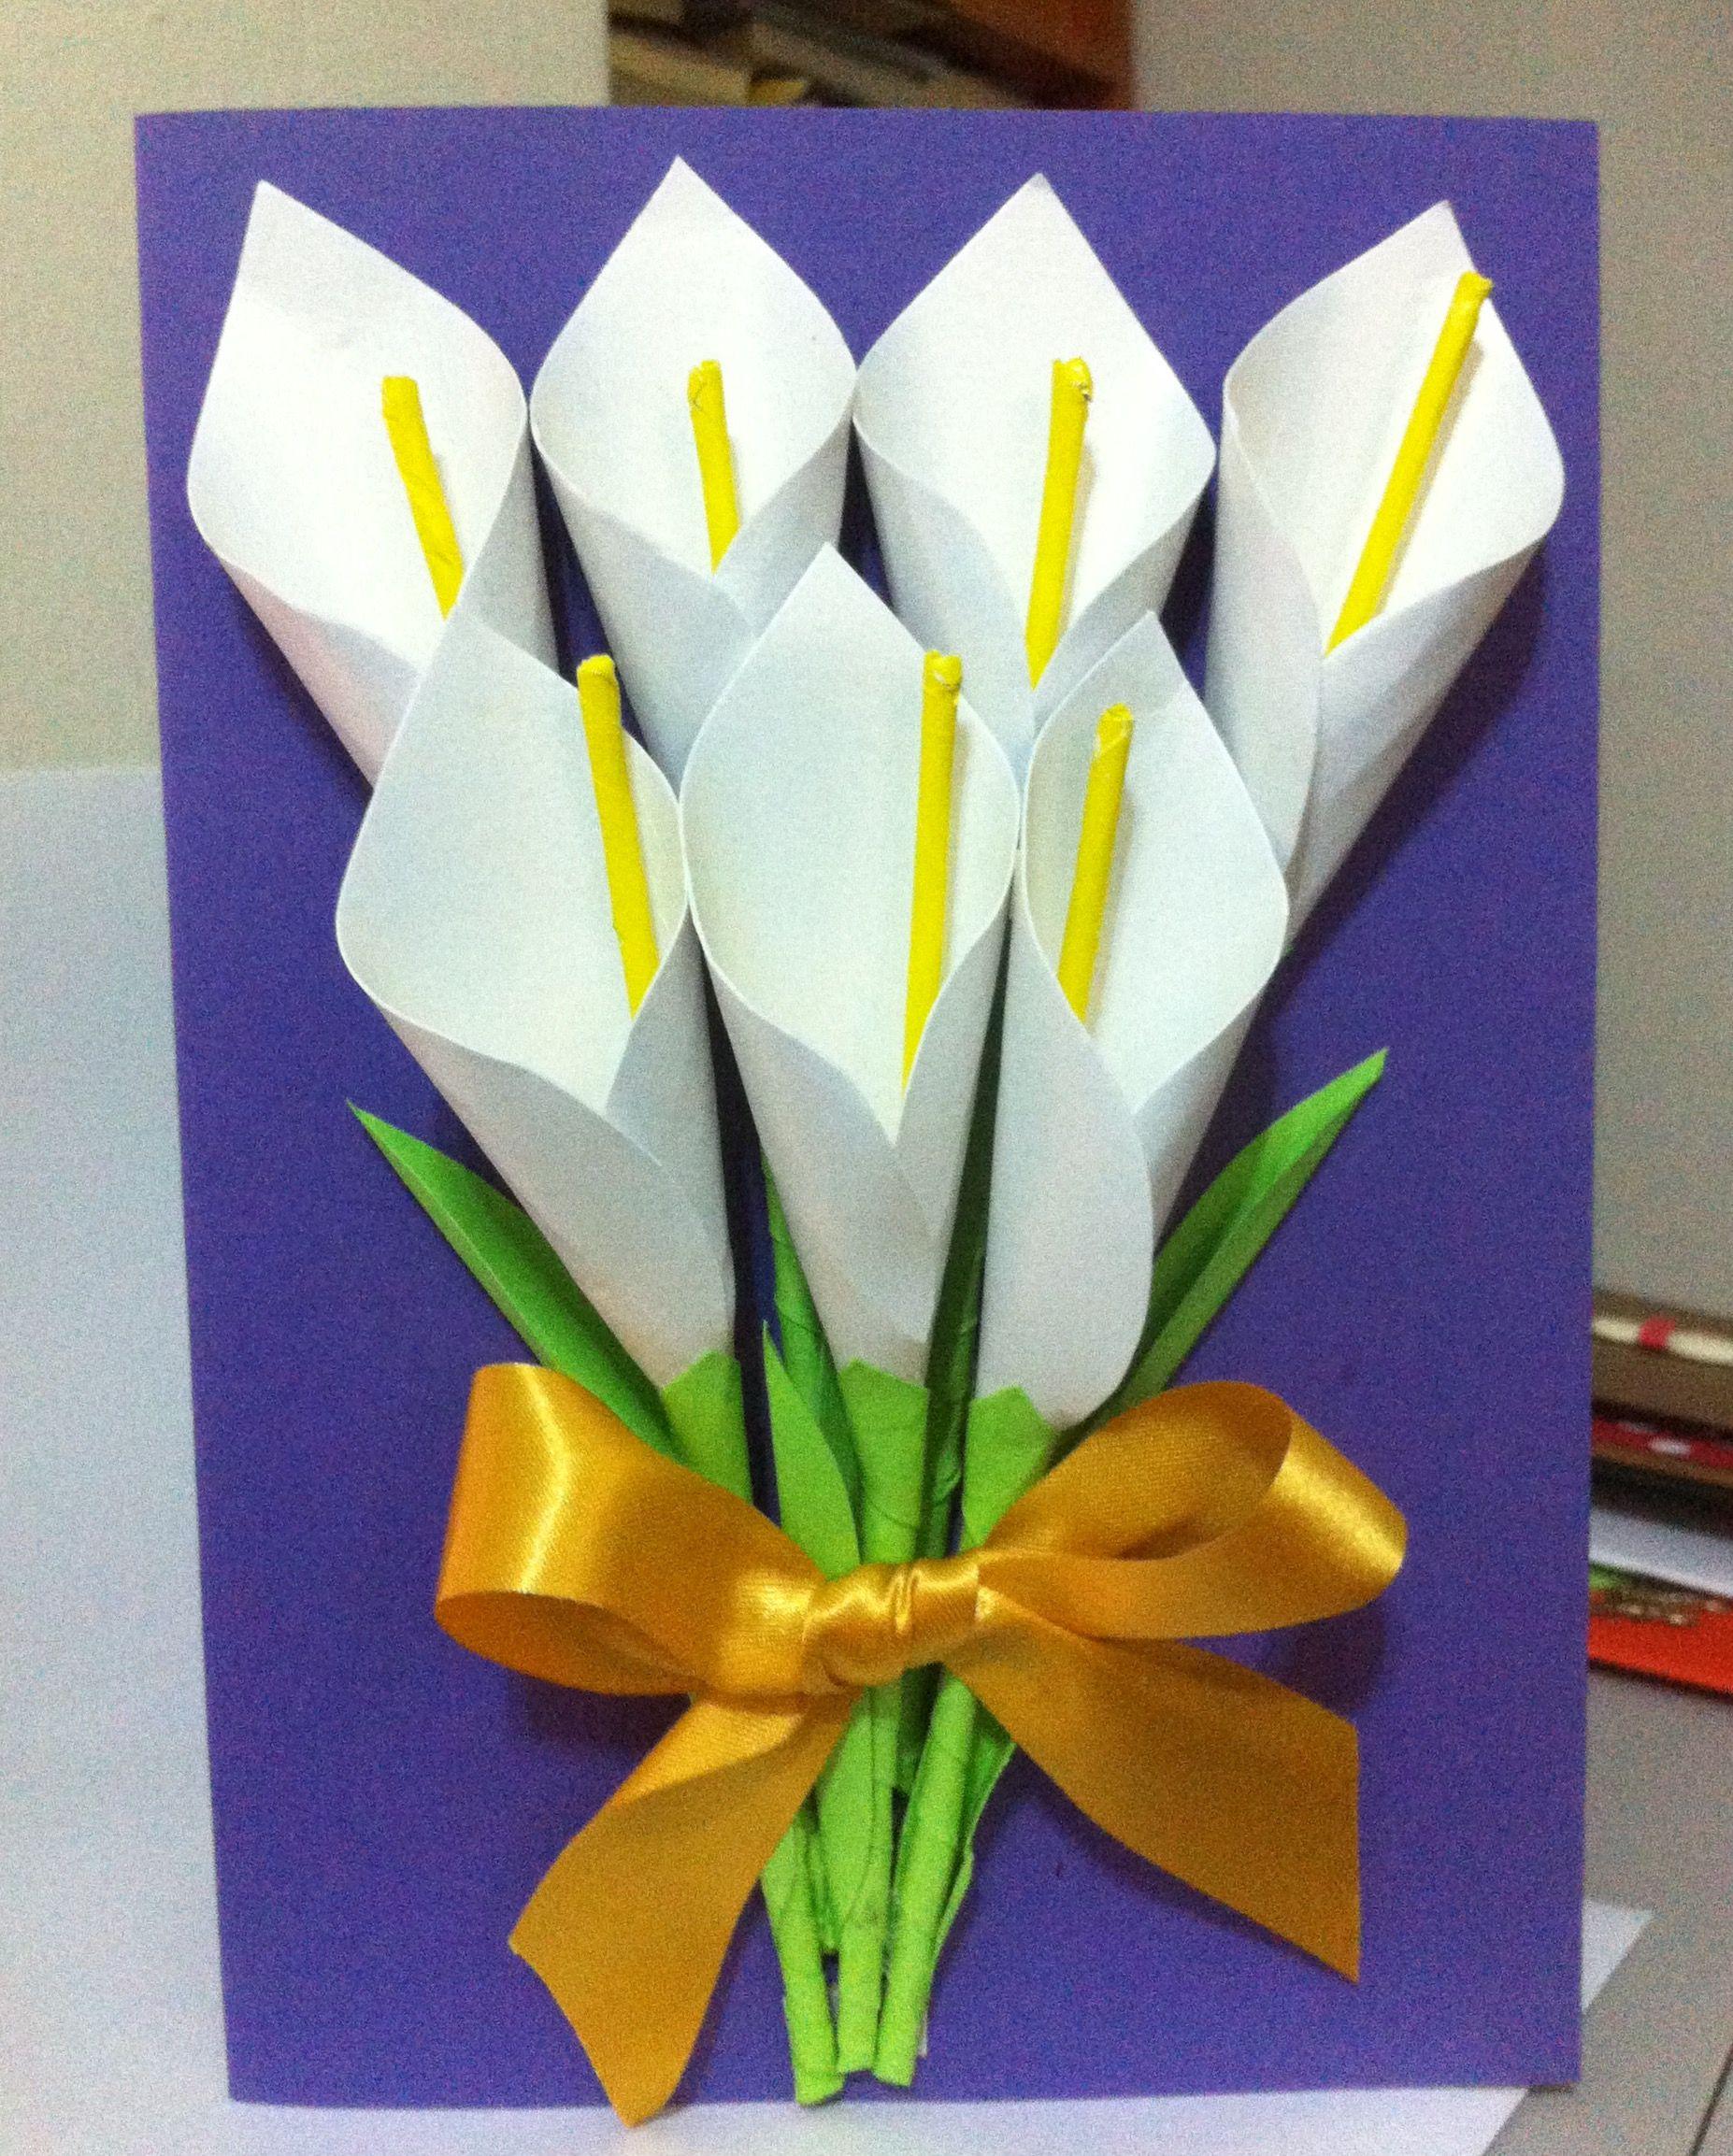 Lilies Handmade Card Handmade Greetings Cards Pinterest Diy